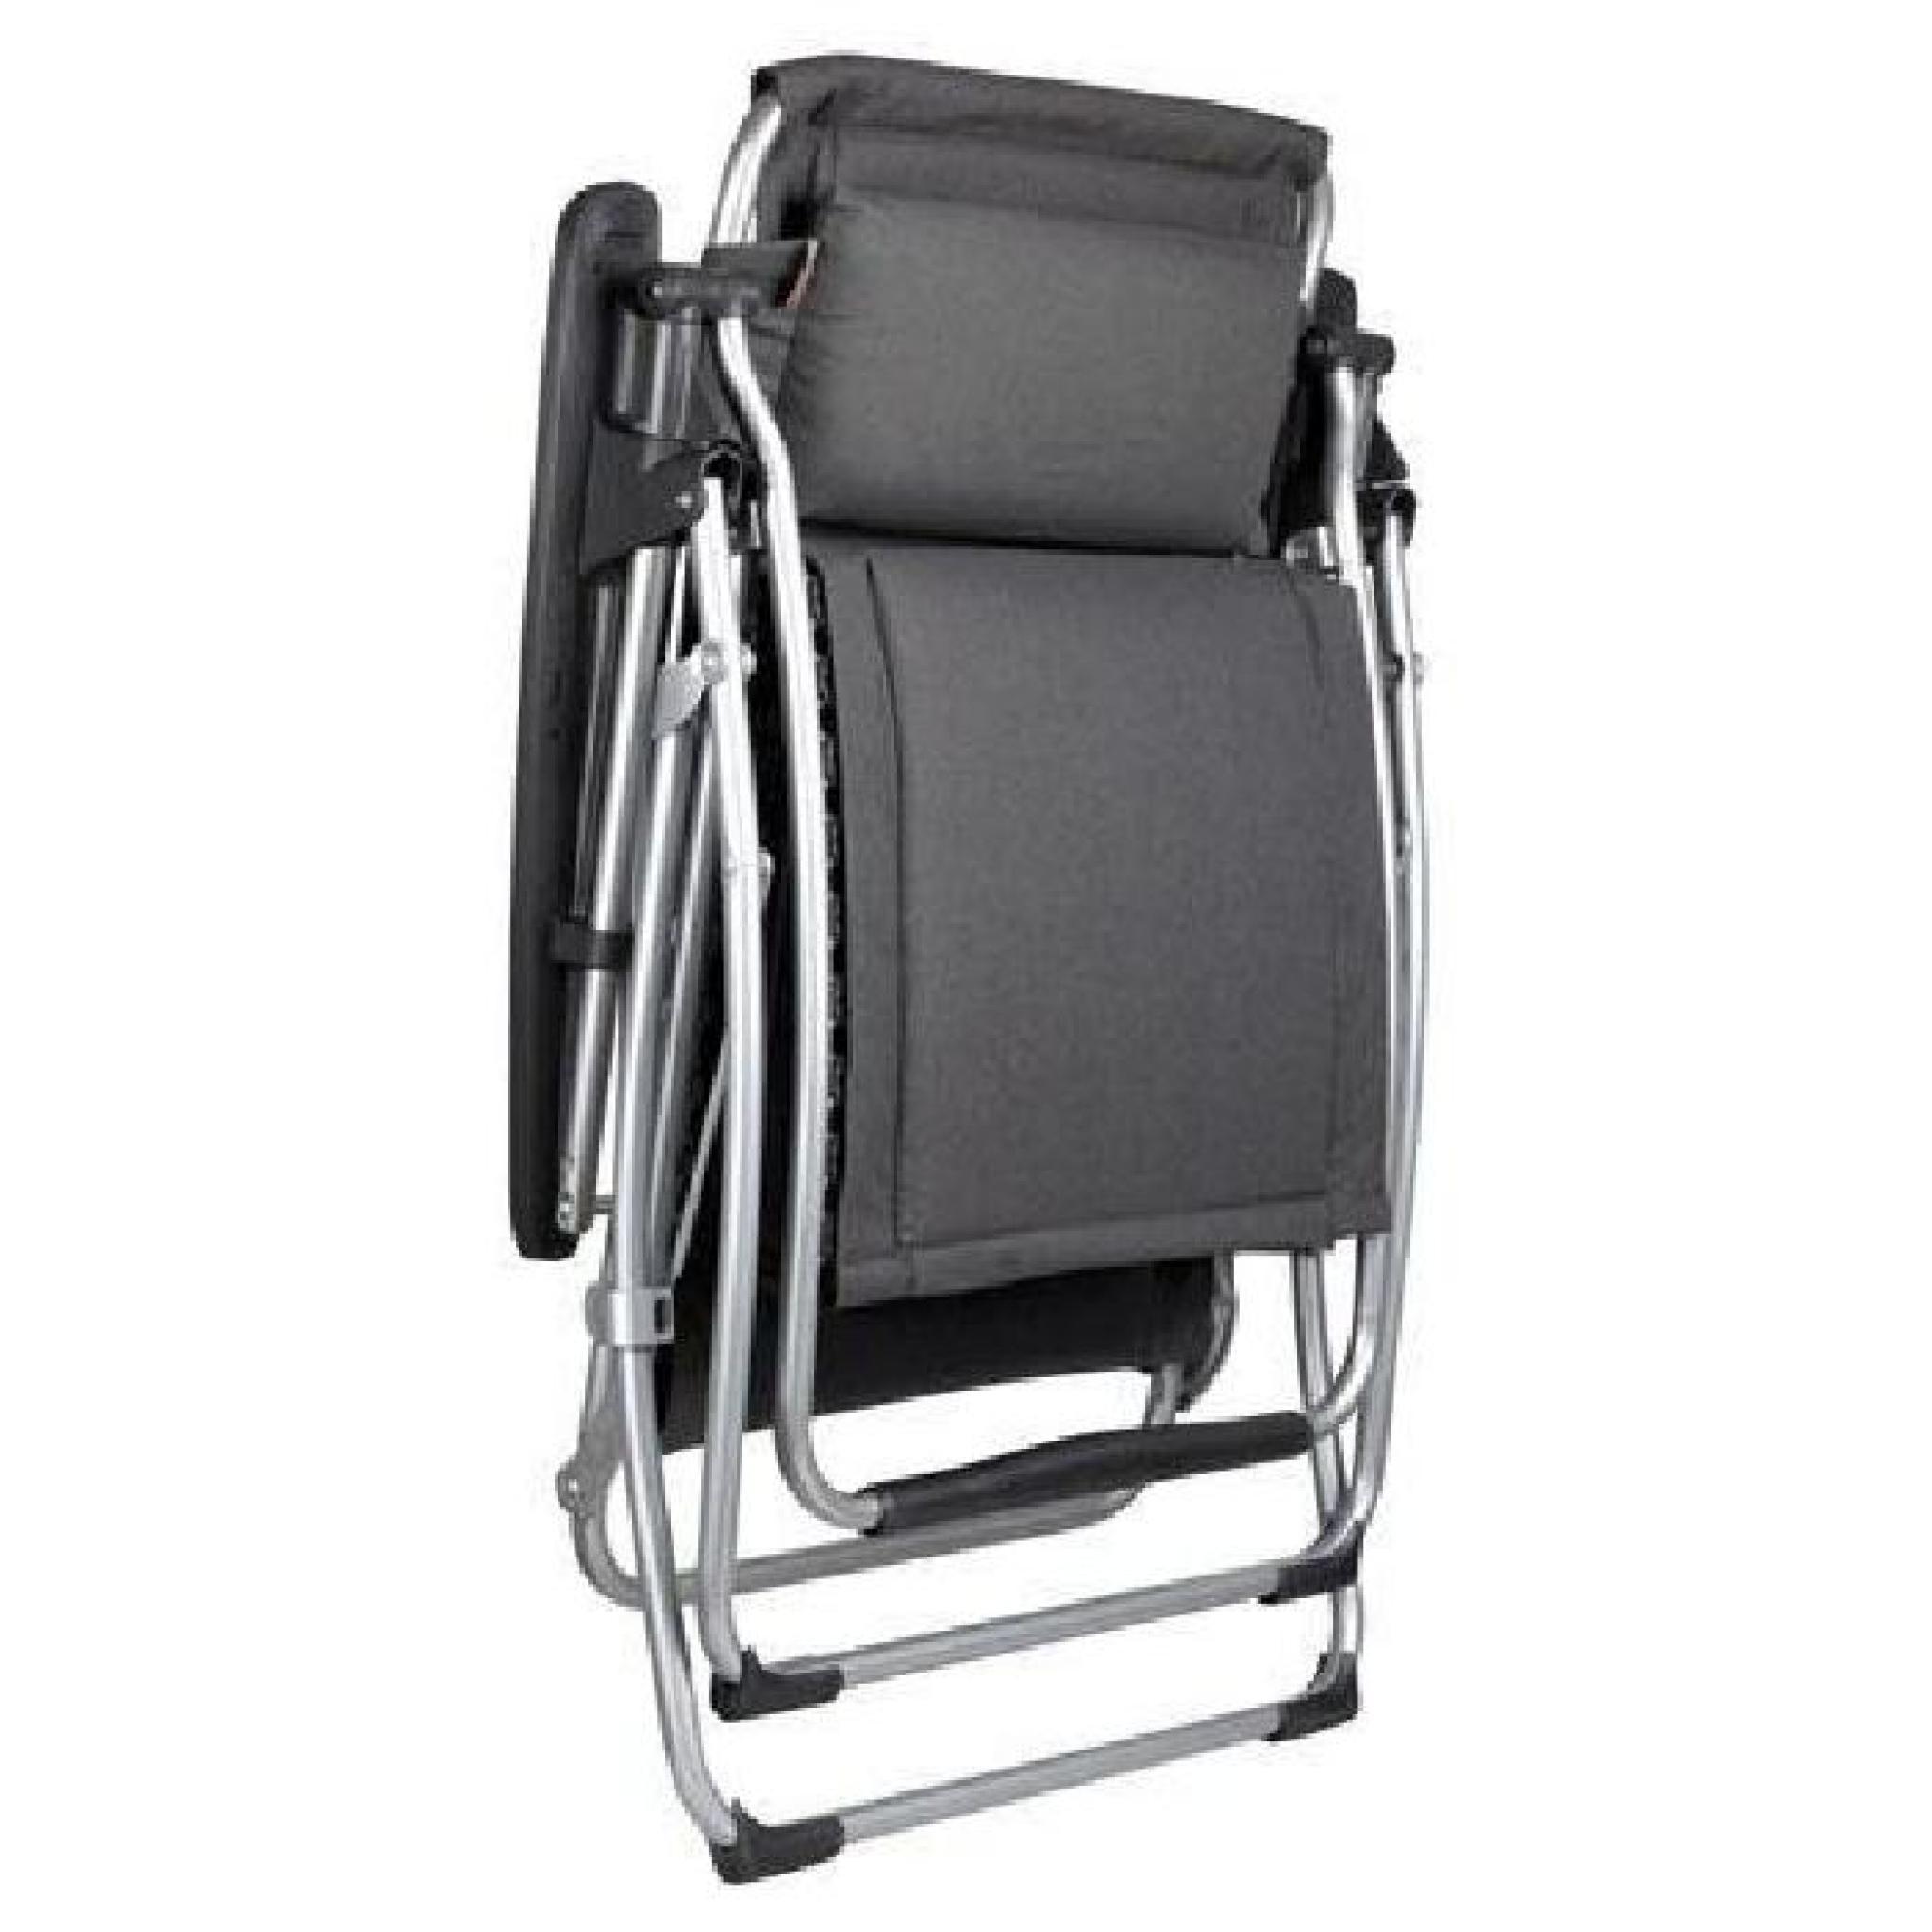 fauteuil relax futura clippe ardoise lafuma achat. Black Bedroom Furniture Sets. Home Design Ideas